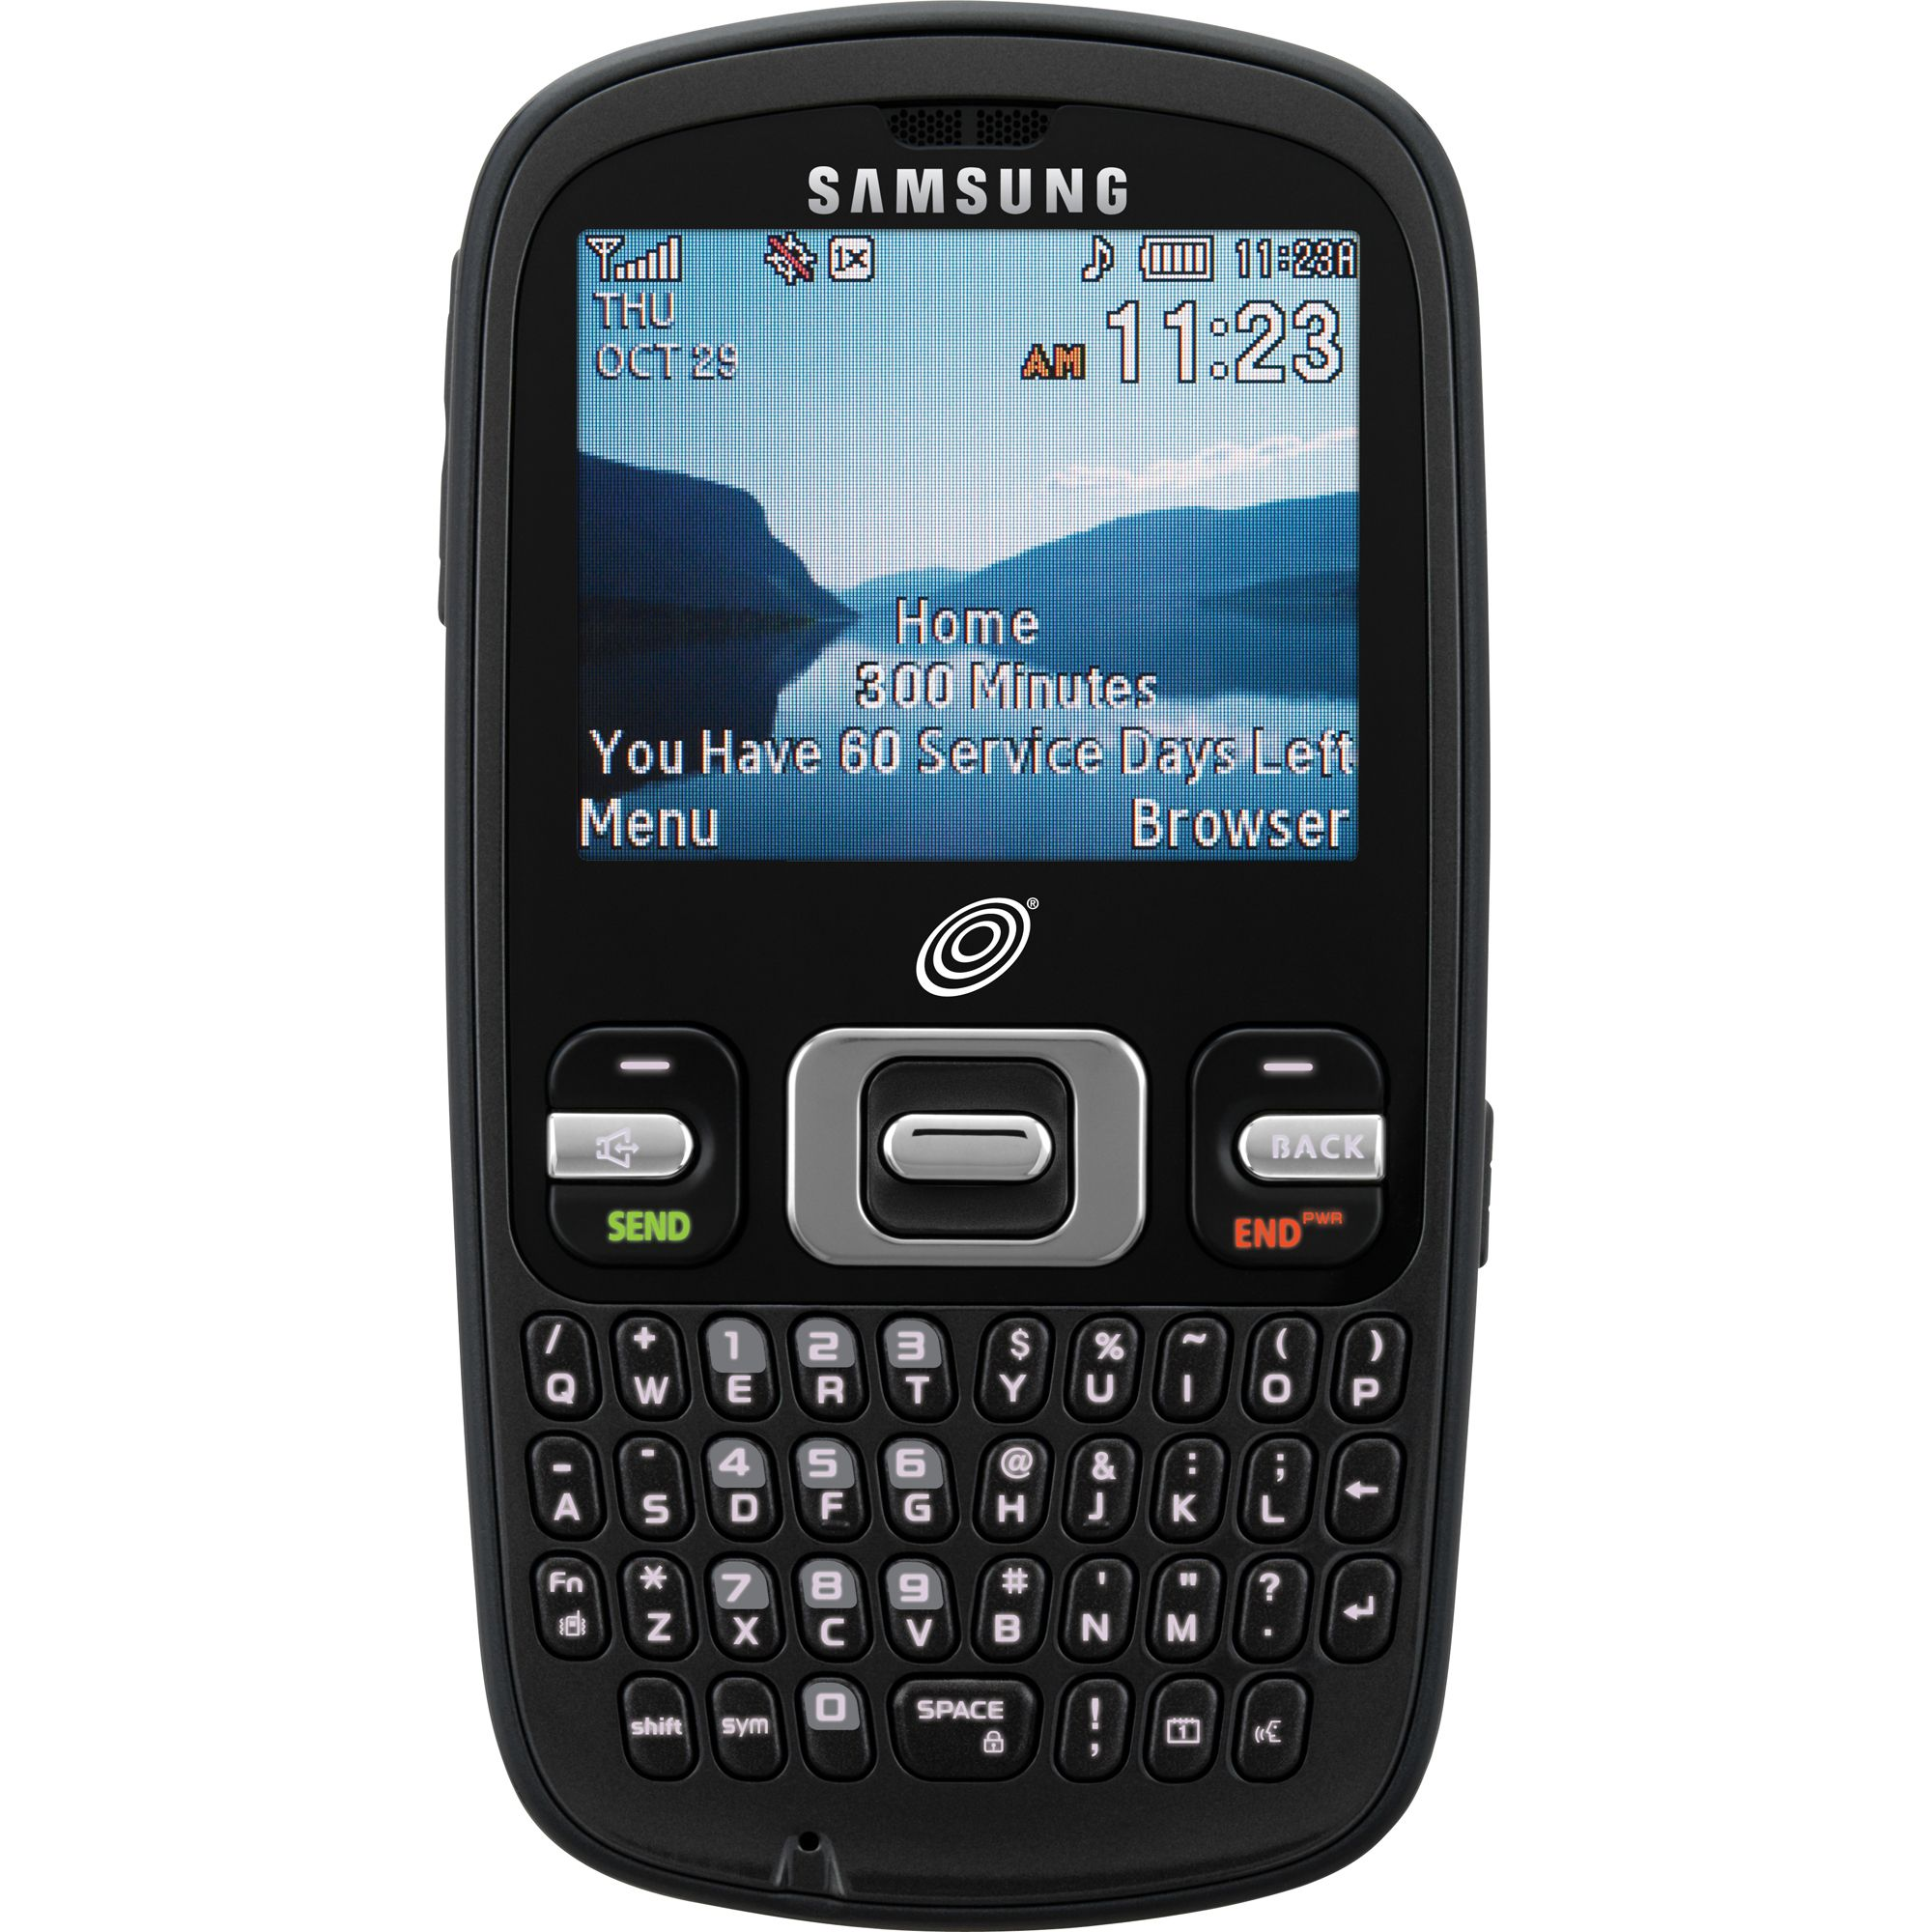 Samsung Cell Phones Prepaid Walmart